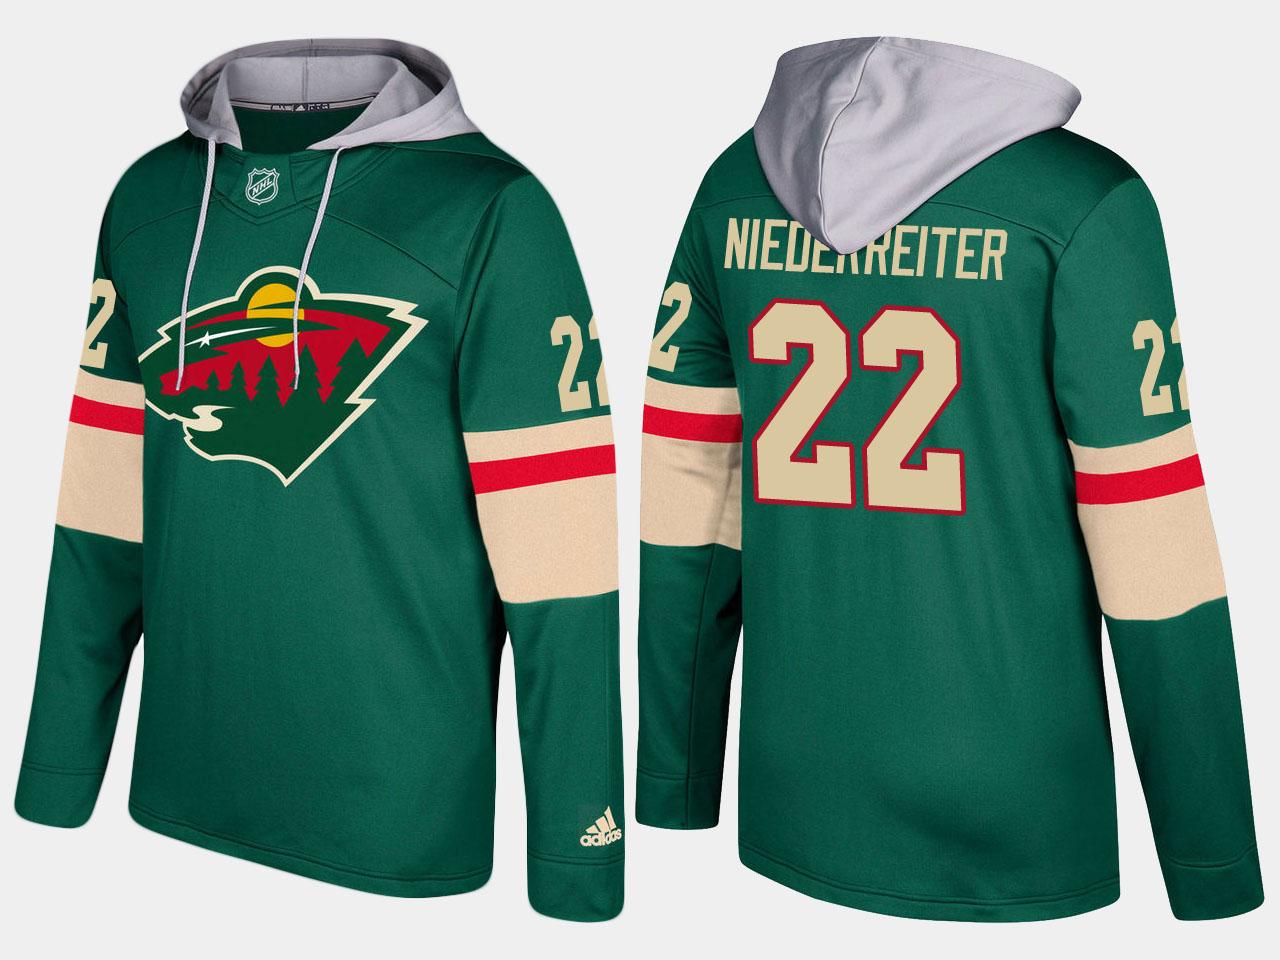 Nike Wild 22 Nino Niederreiter Name And Number Green Hoodie